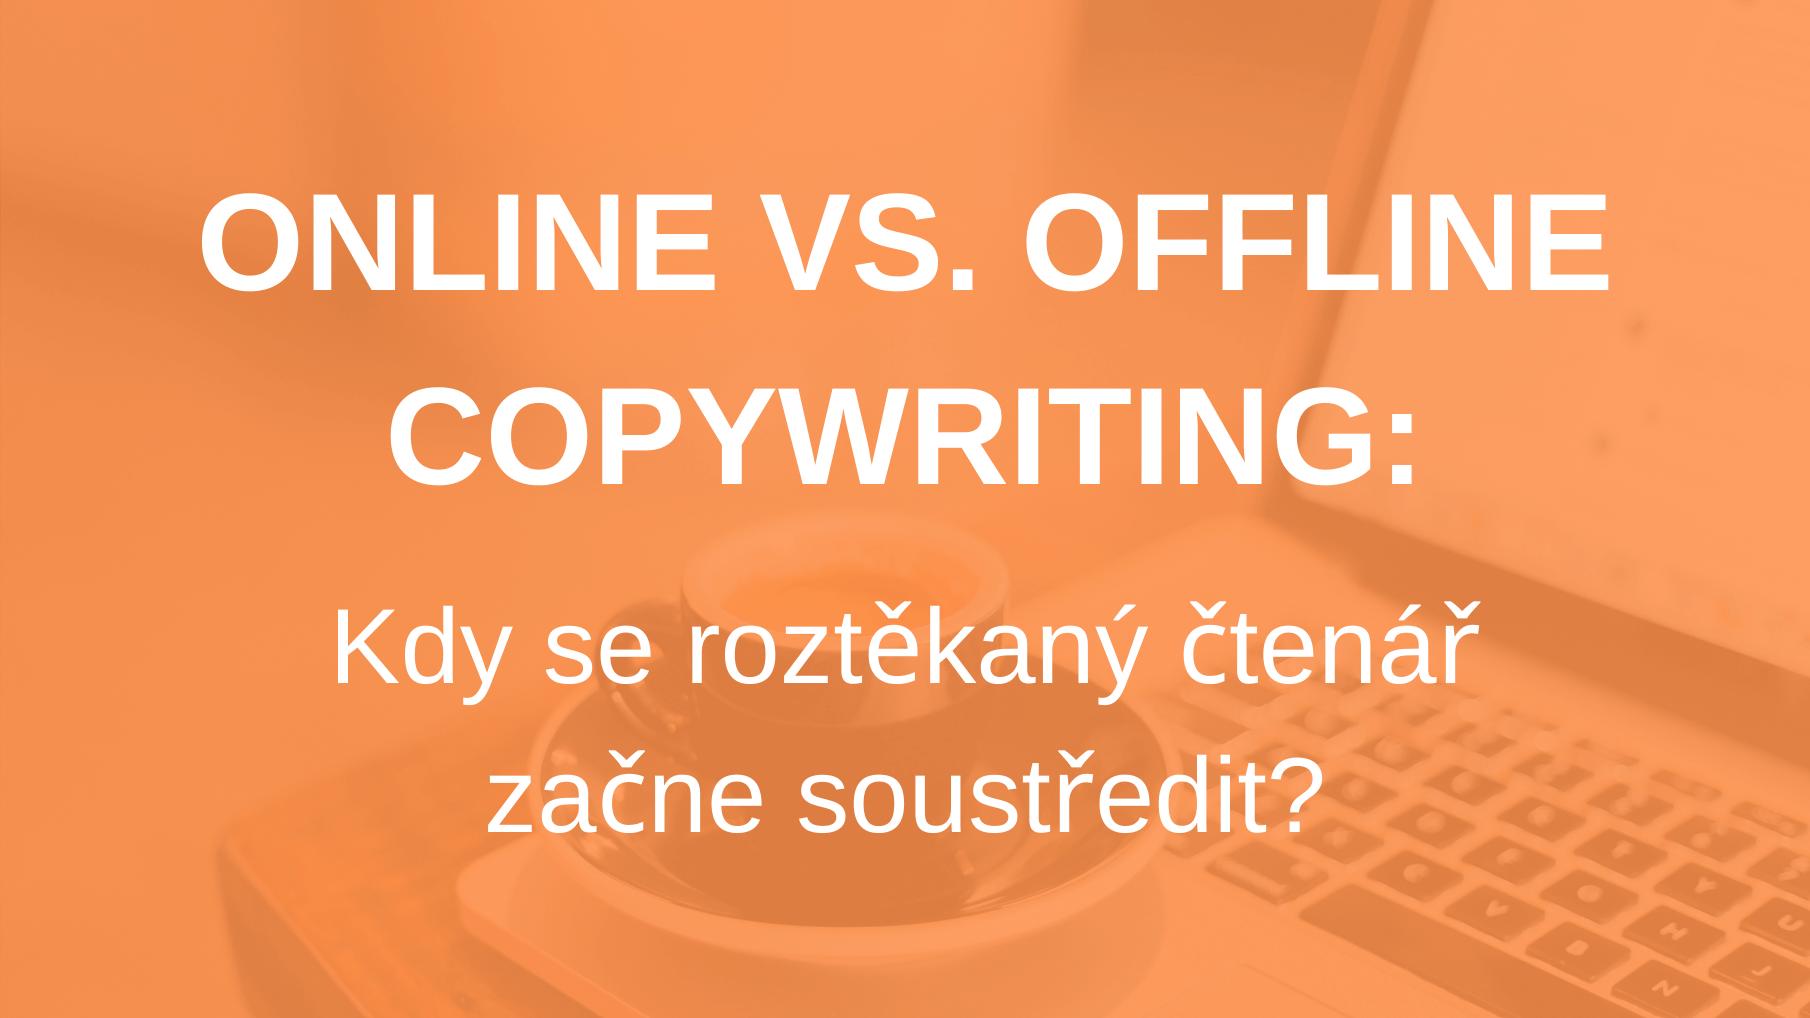 Online Vs Offline Copywriting